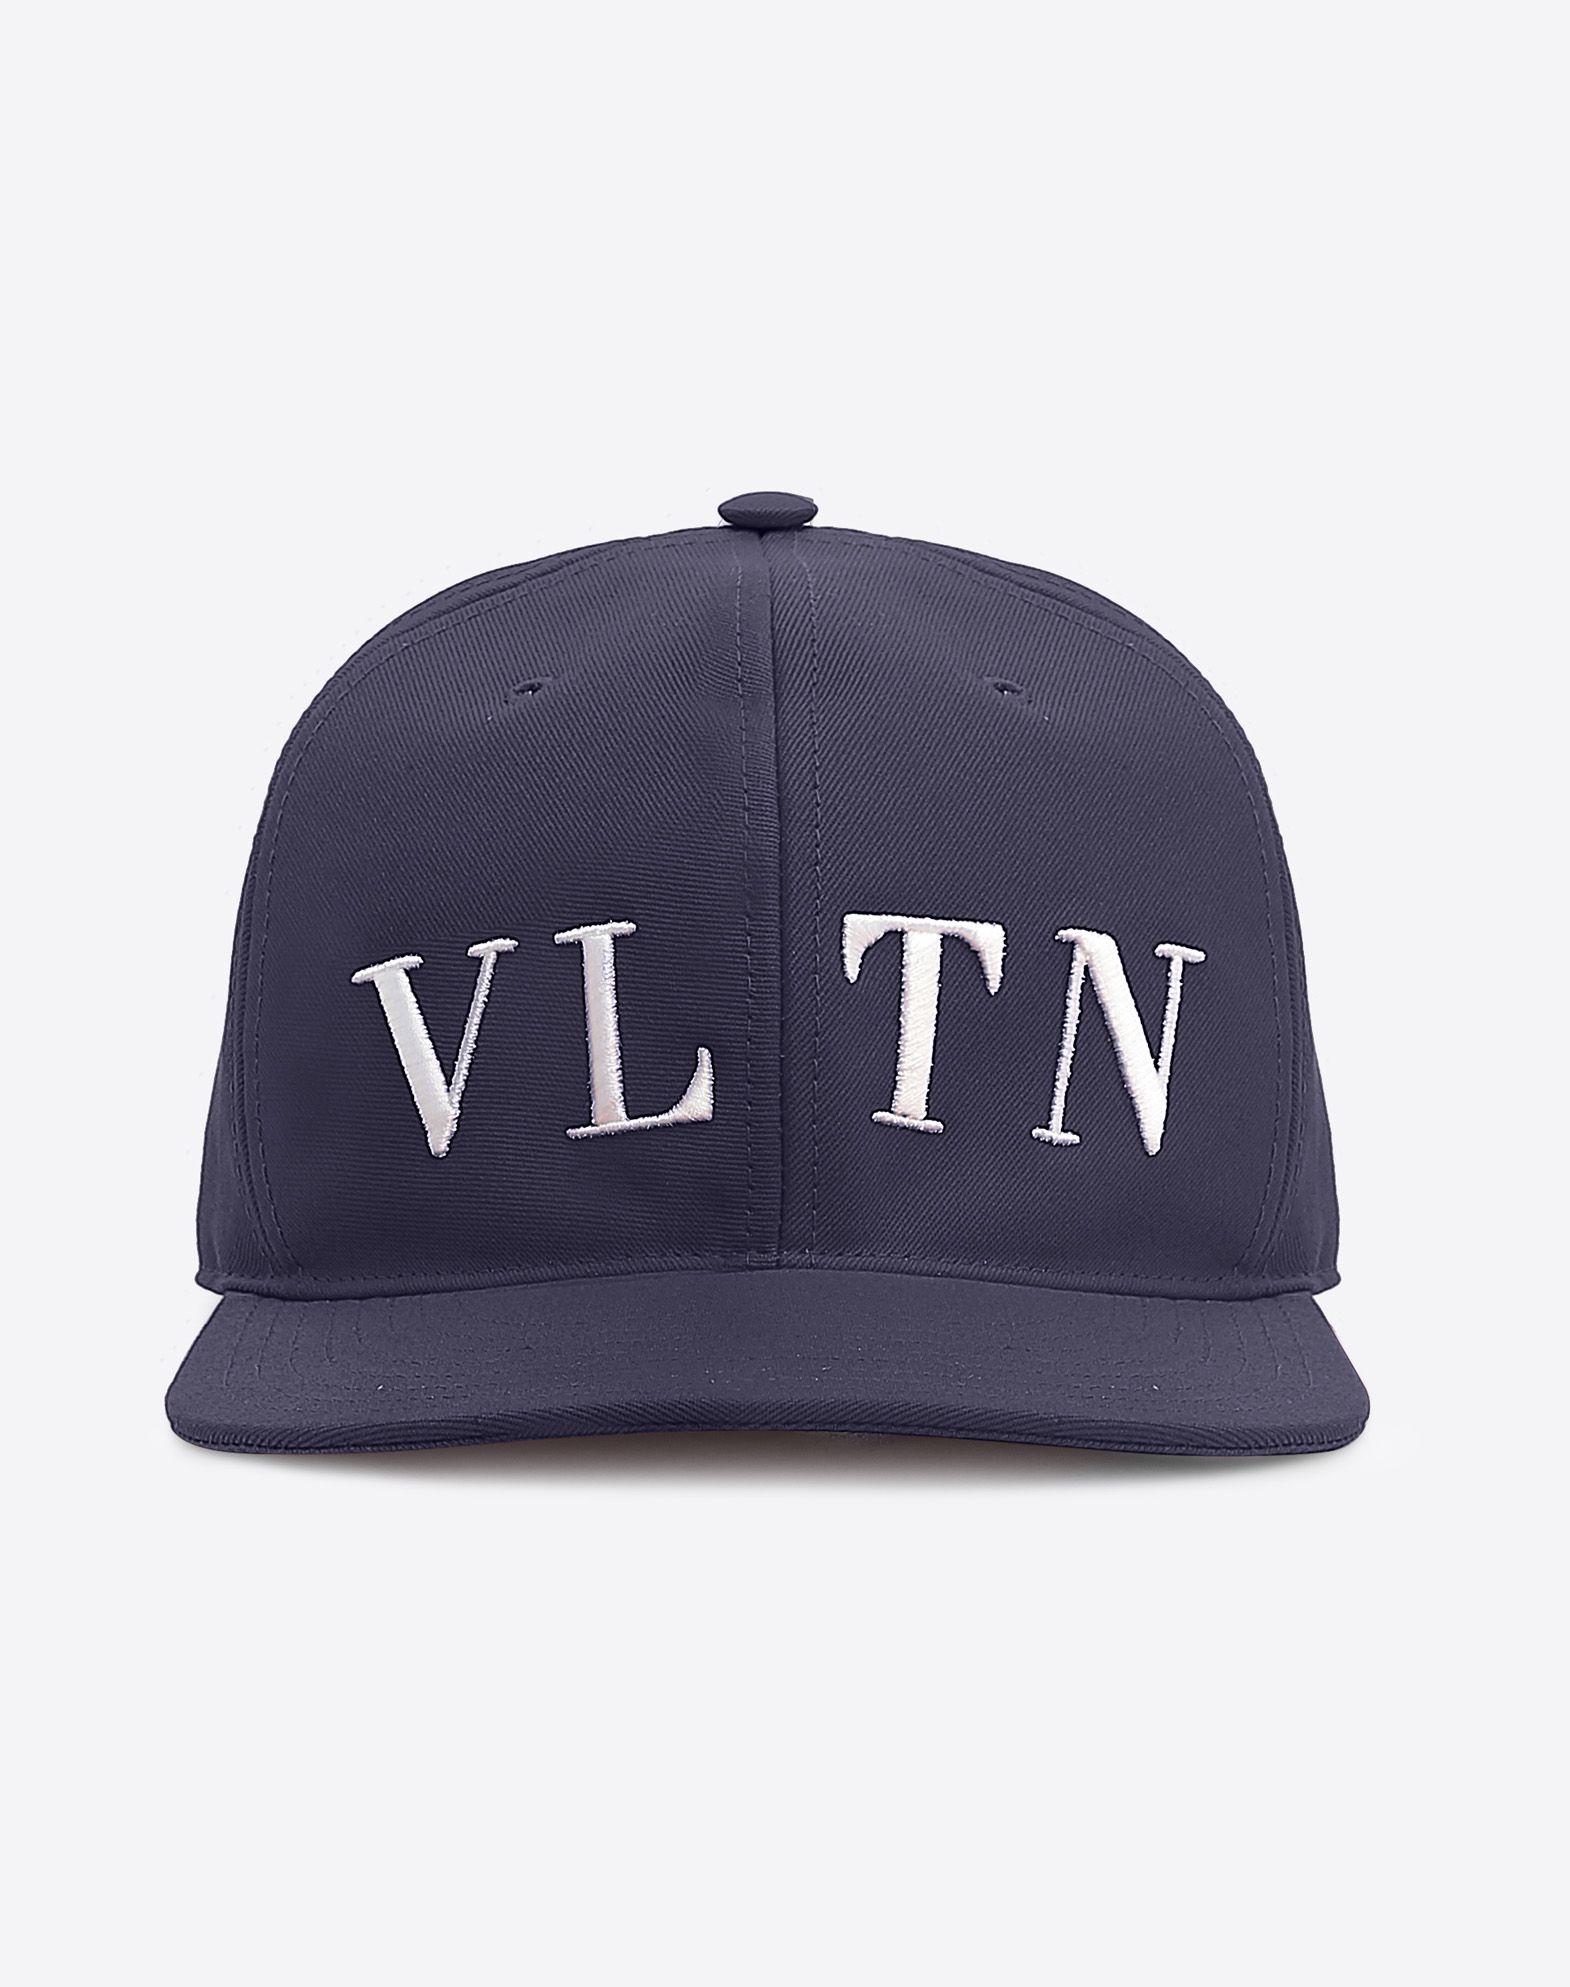 VALENTINO Gabardine Embroidered detailing Hard visor  46563926lh